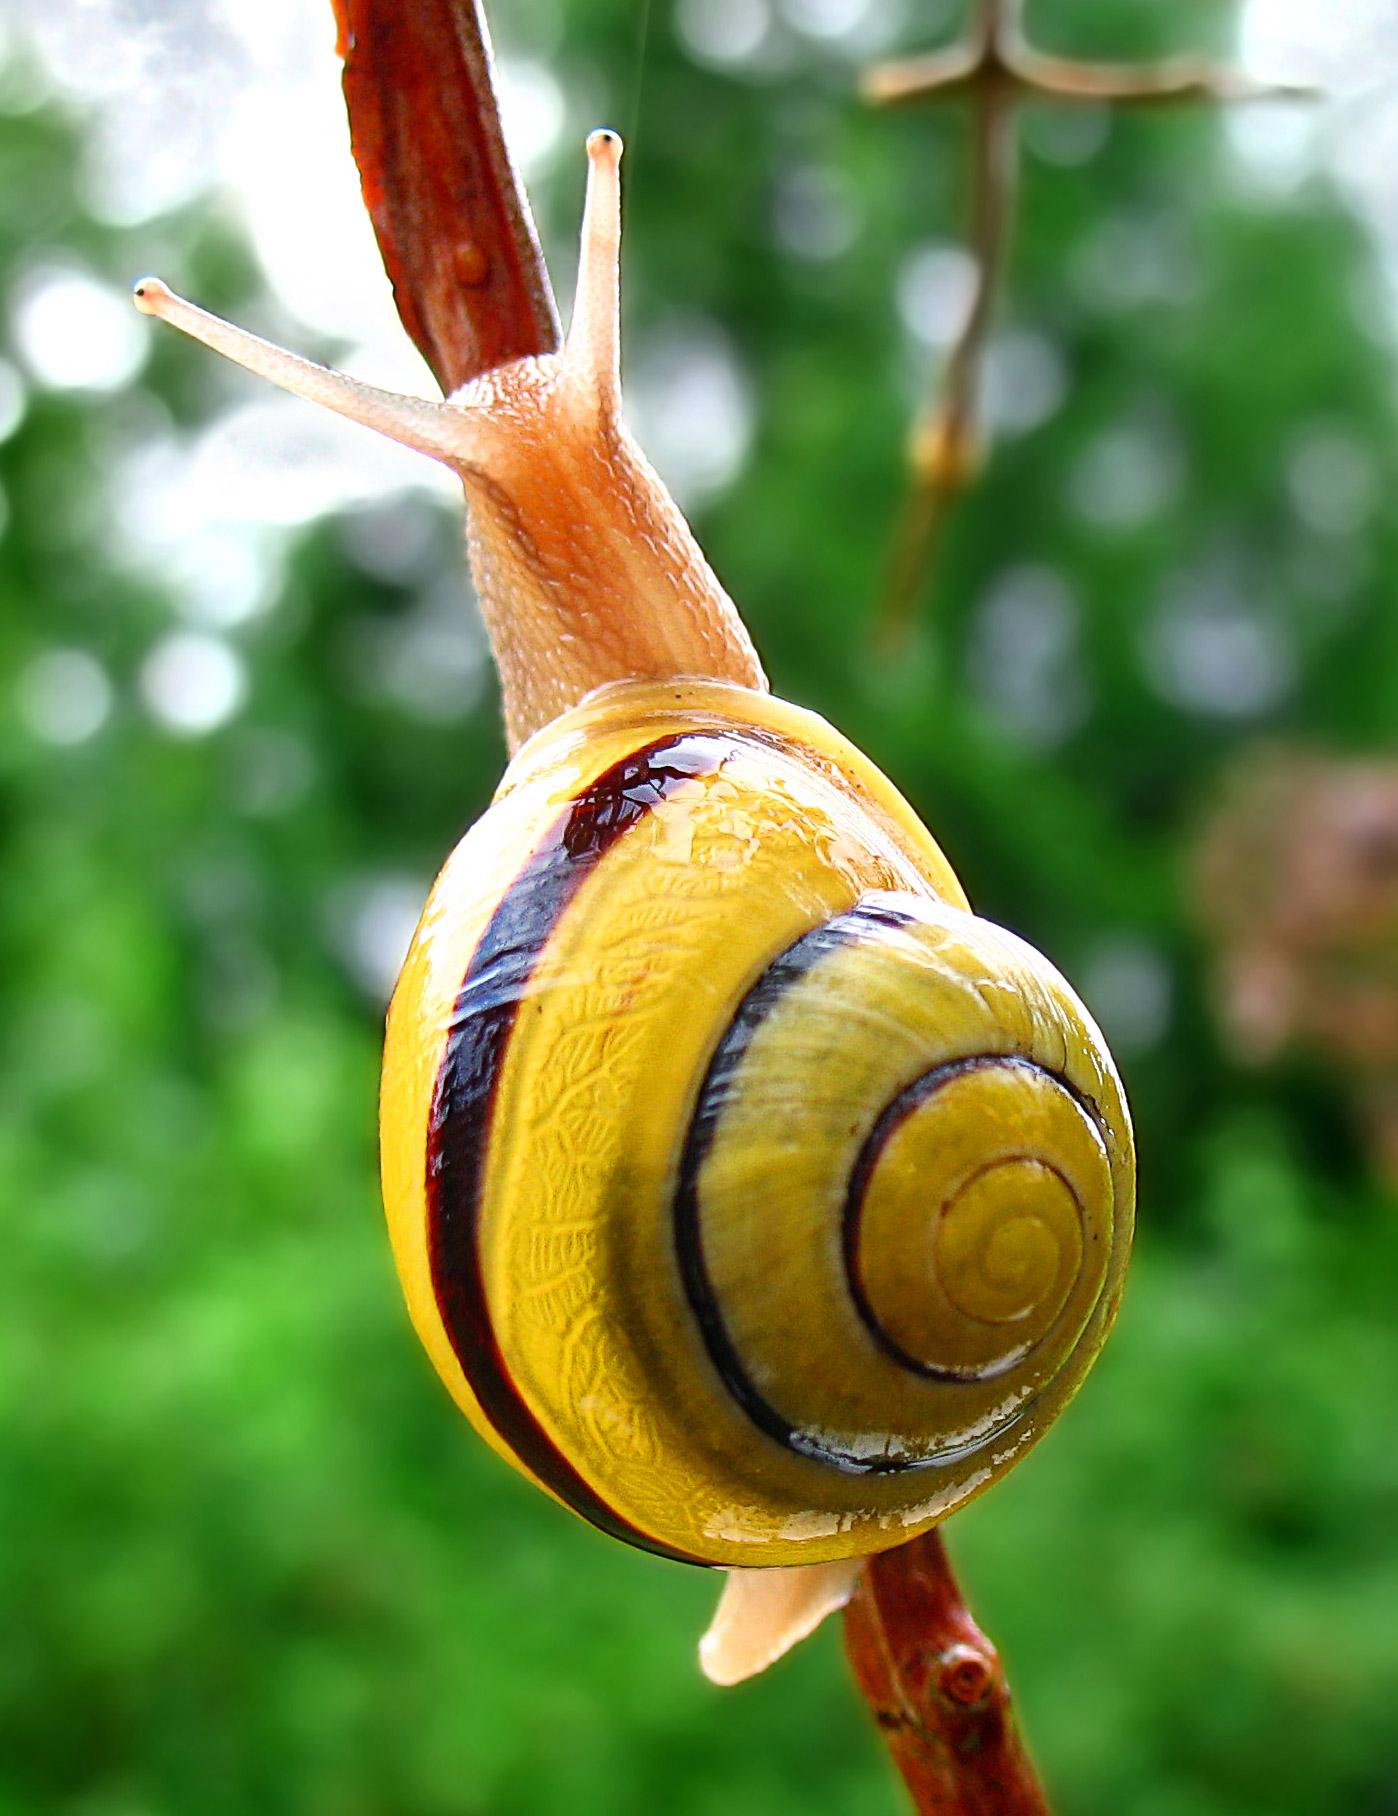 https://i2.wp.com/upload.wikimedia.org/wikipedia/commons/a/a1/Snail-WA_edit02.jpg